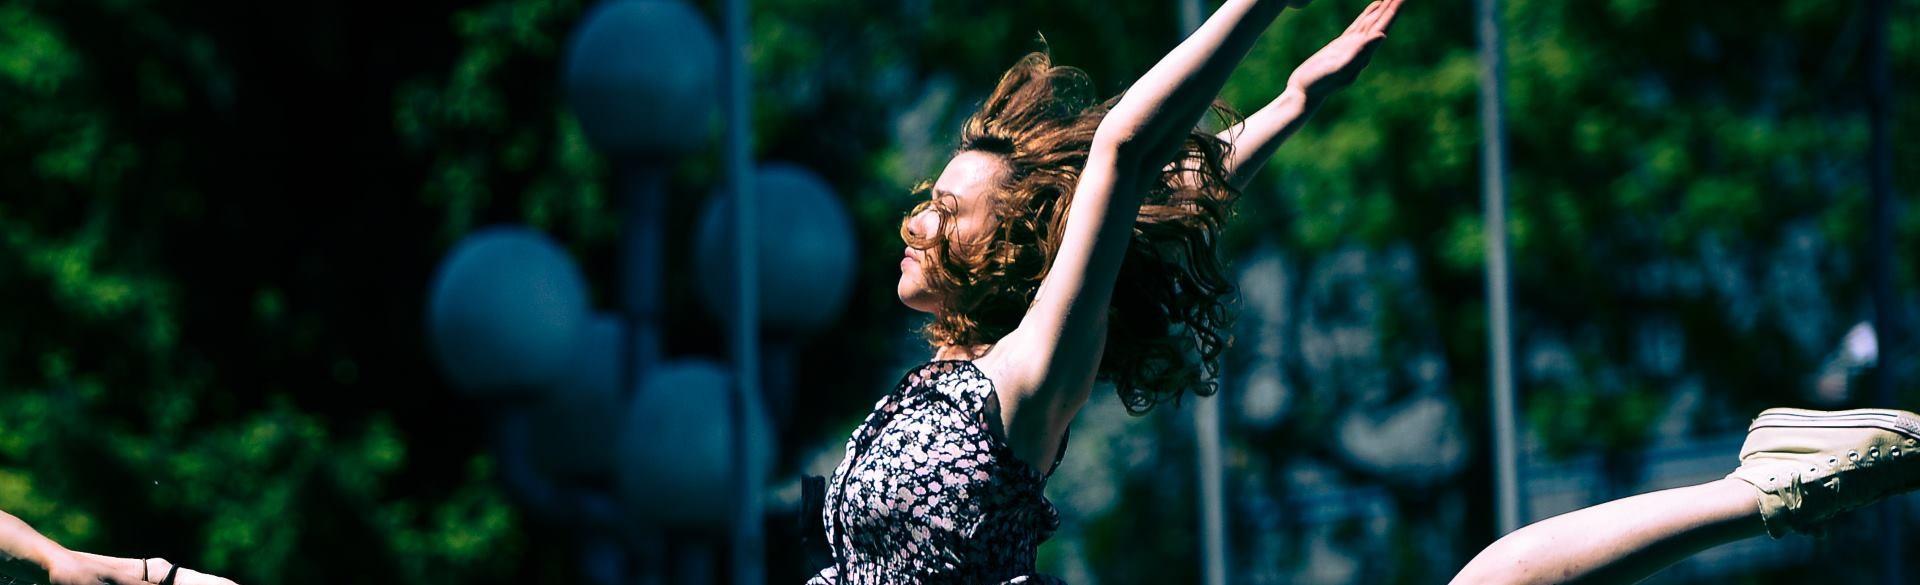 Hip hop, balet, jazz i suvremeni ples na DanceStaru okupljaju pet tisuća plesača